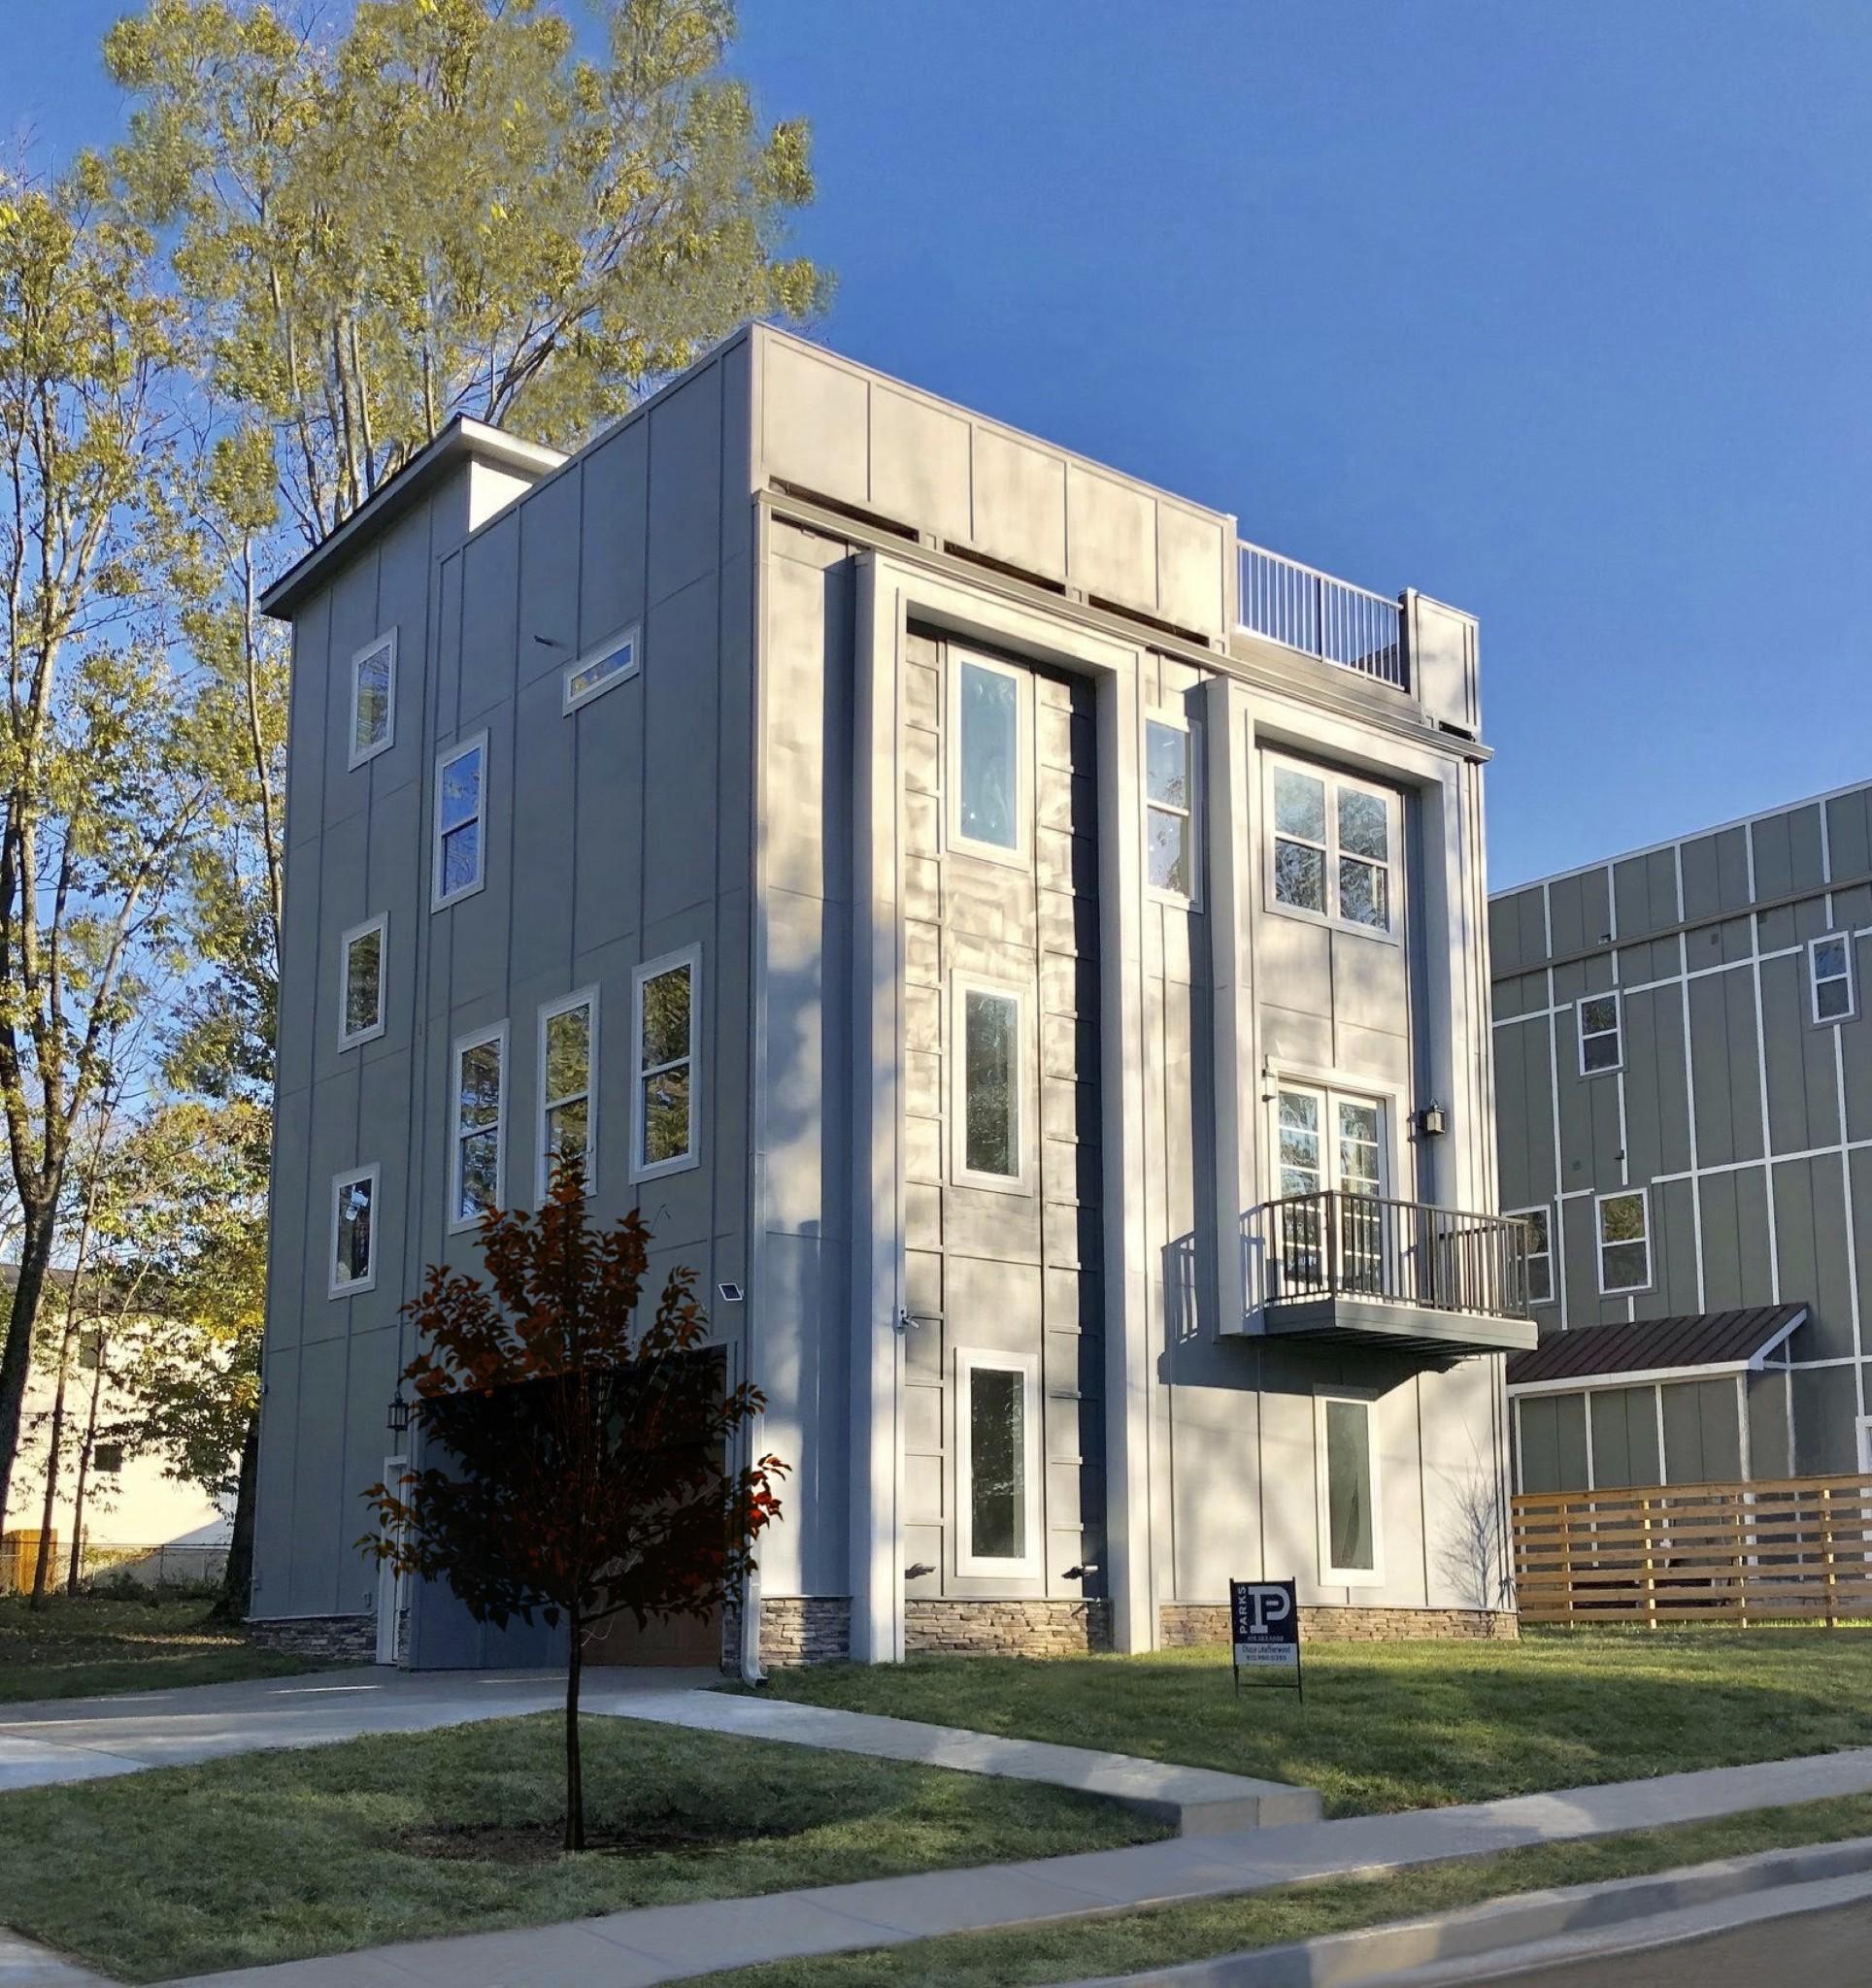 2426 Little Ave, Nashville, TN 37206 - Nashville, TN real estate listing